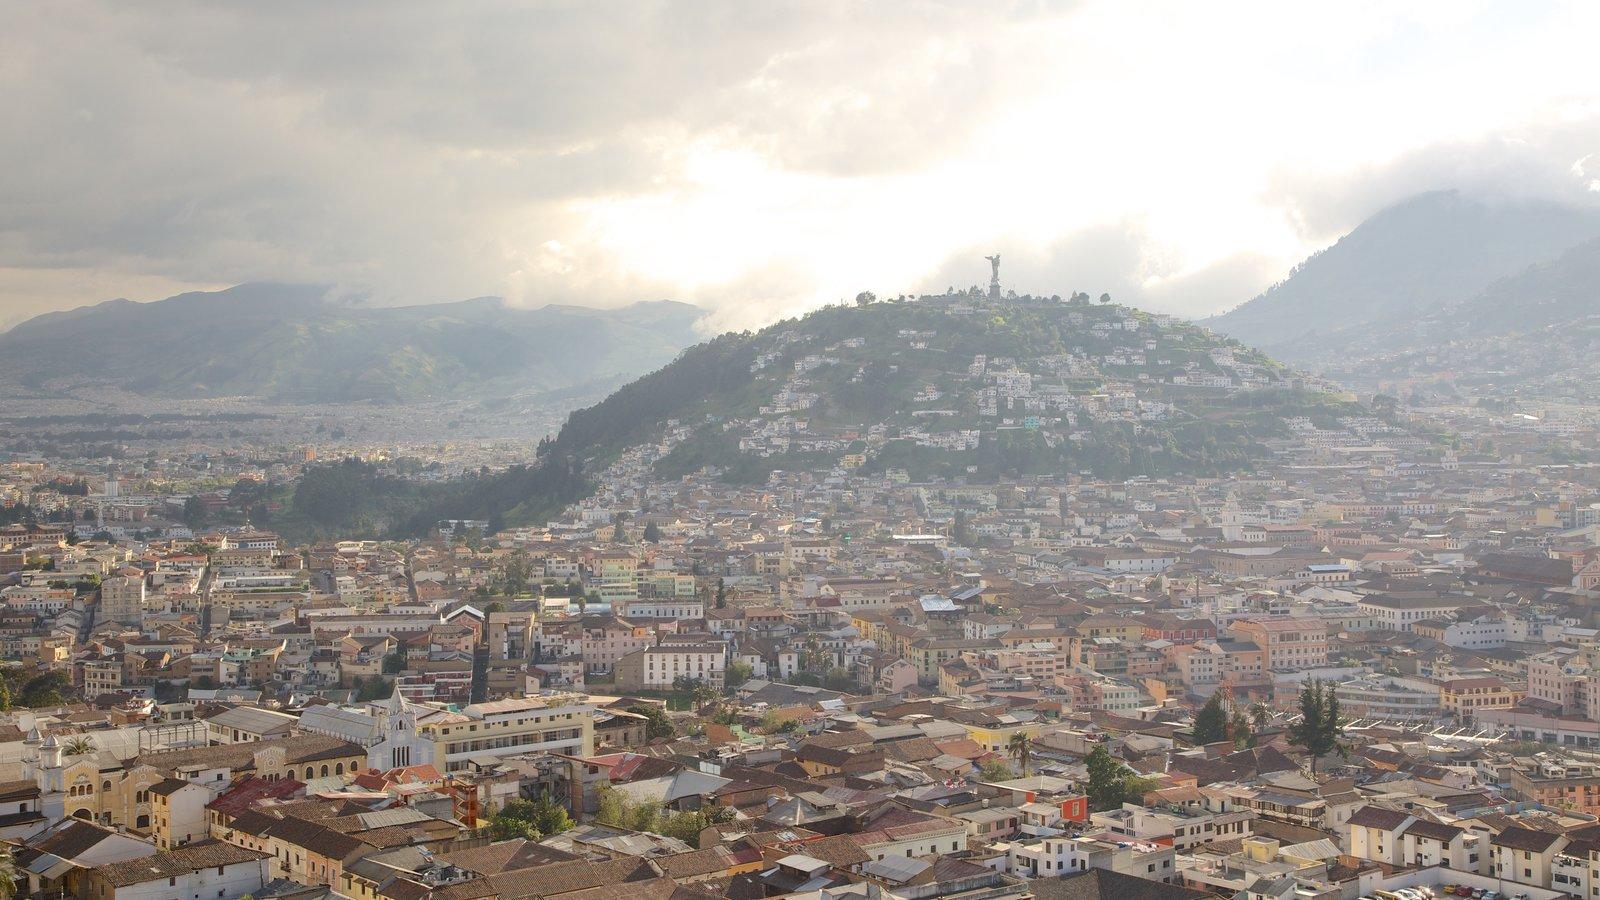 Parque Itchimbia caracterizando uma cidade